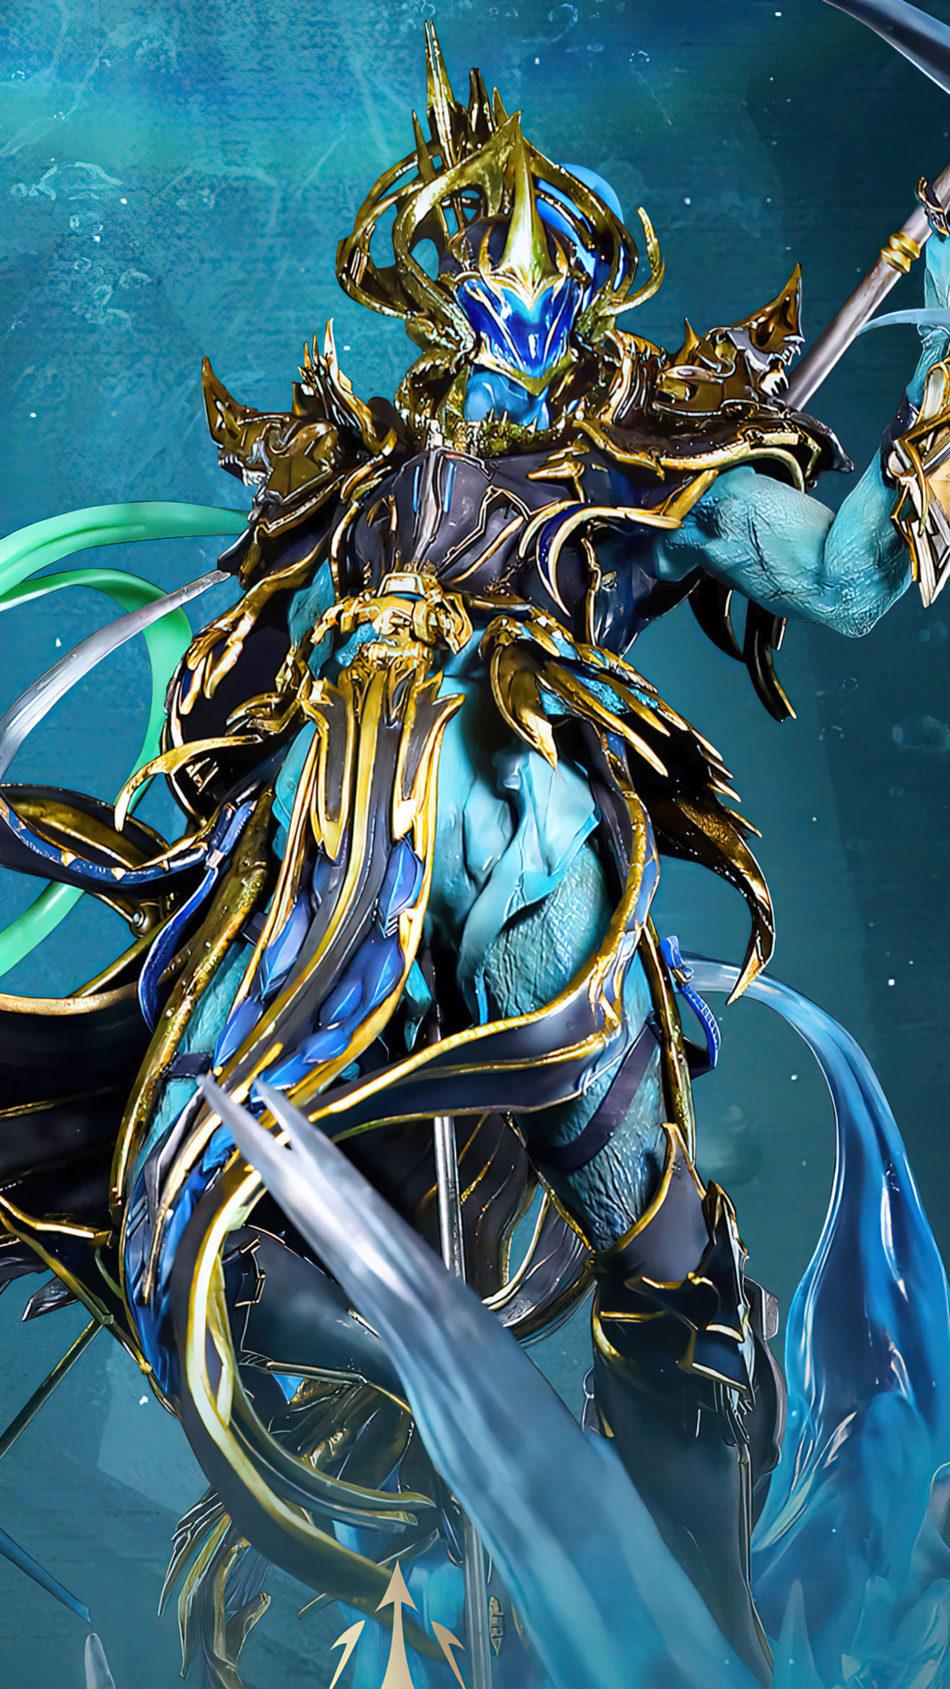 Poseidon X-Suit PUBG Mobile 4K Ultra HD Mobile Wallpaper